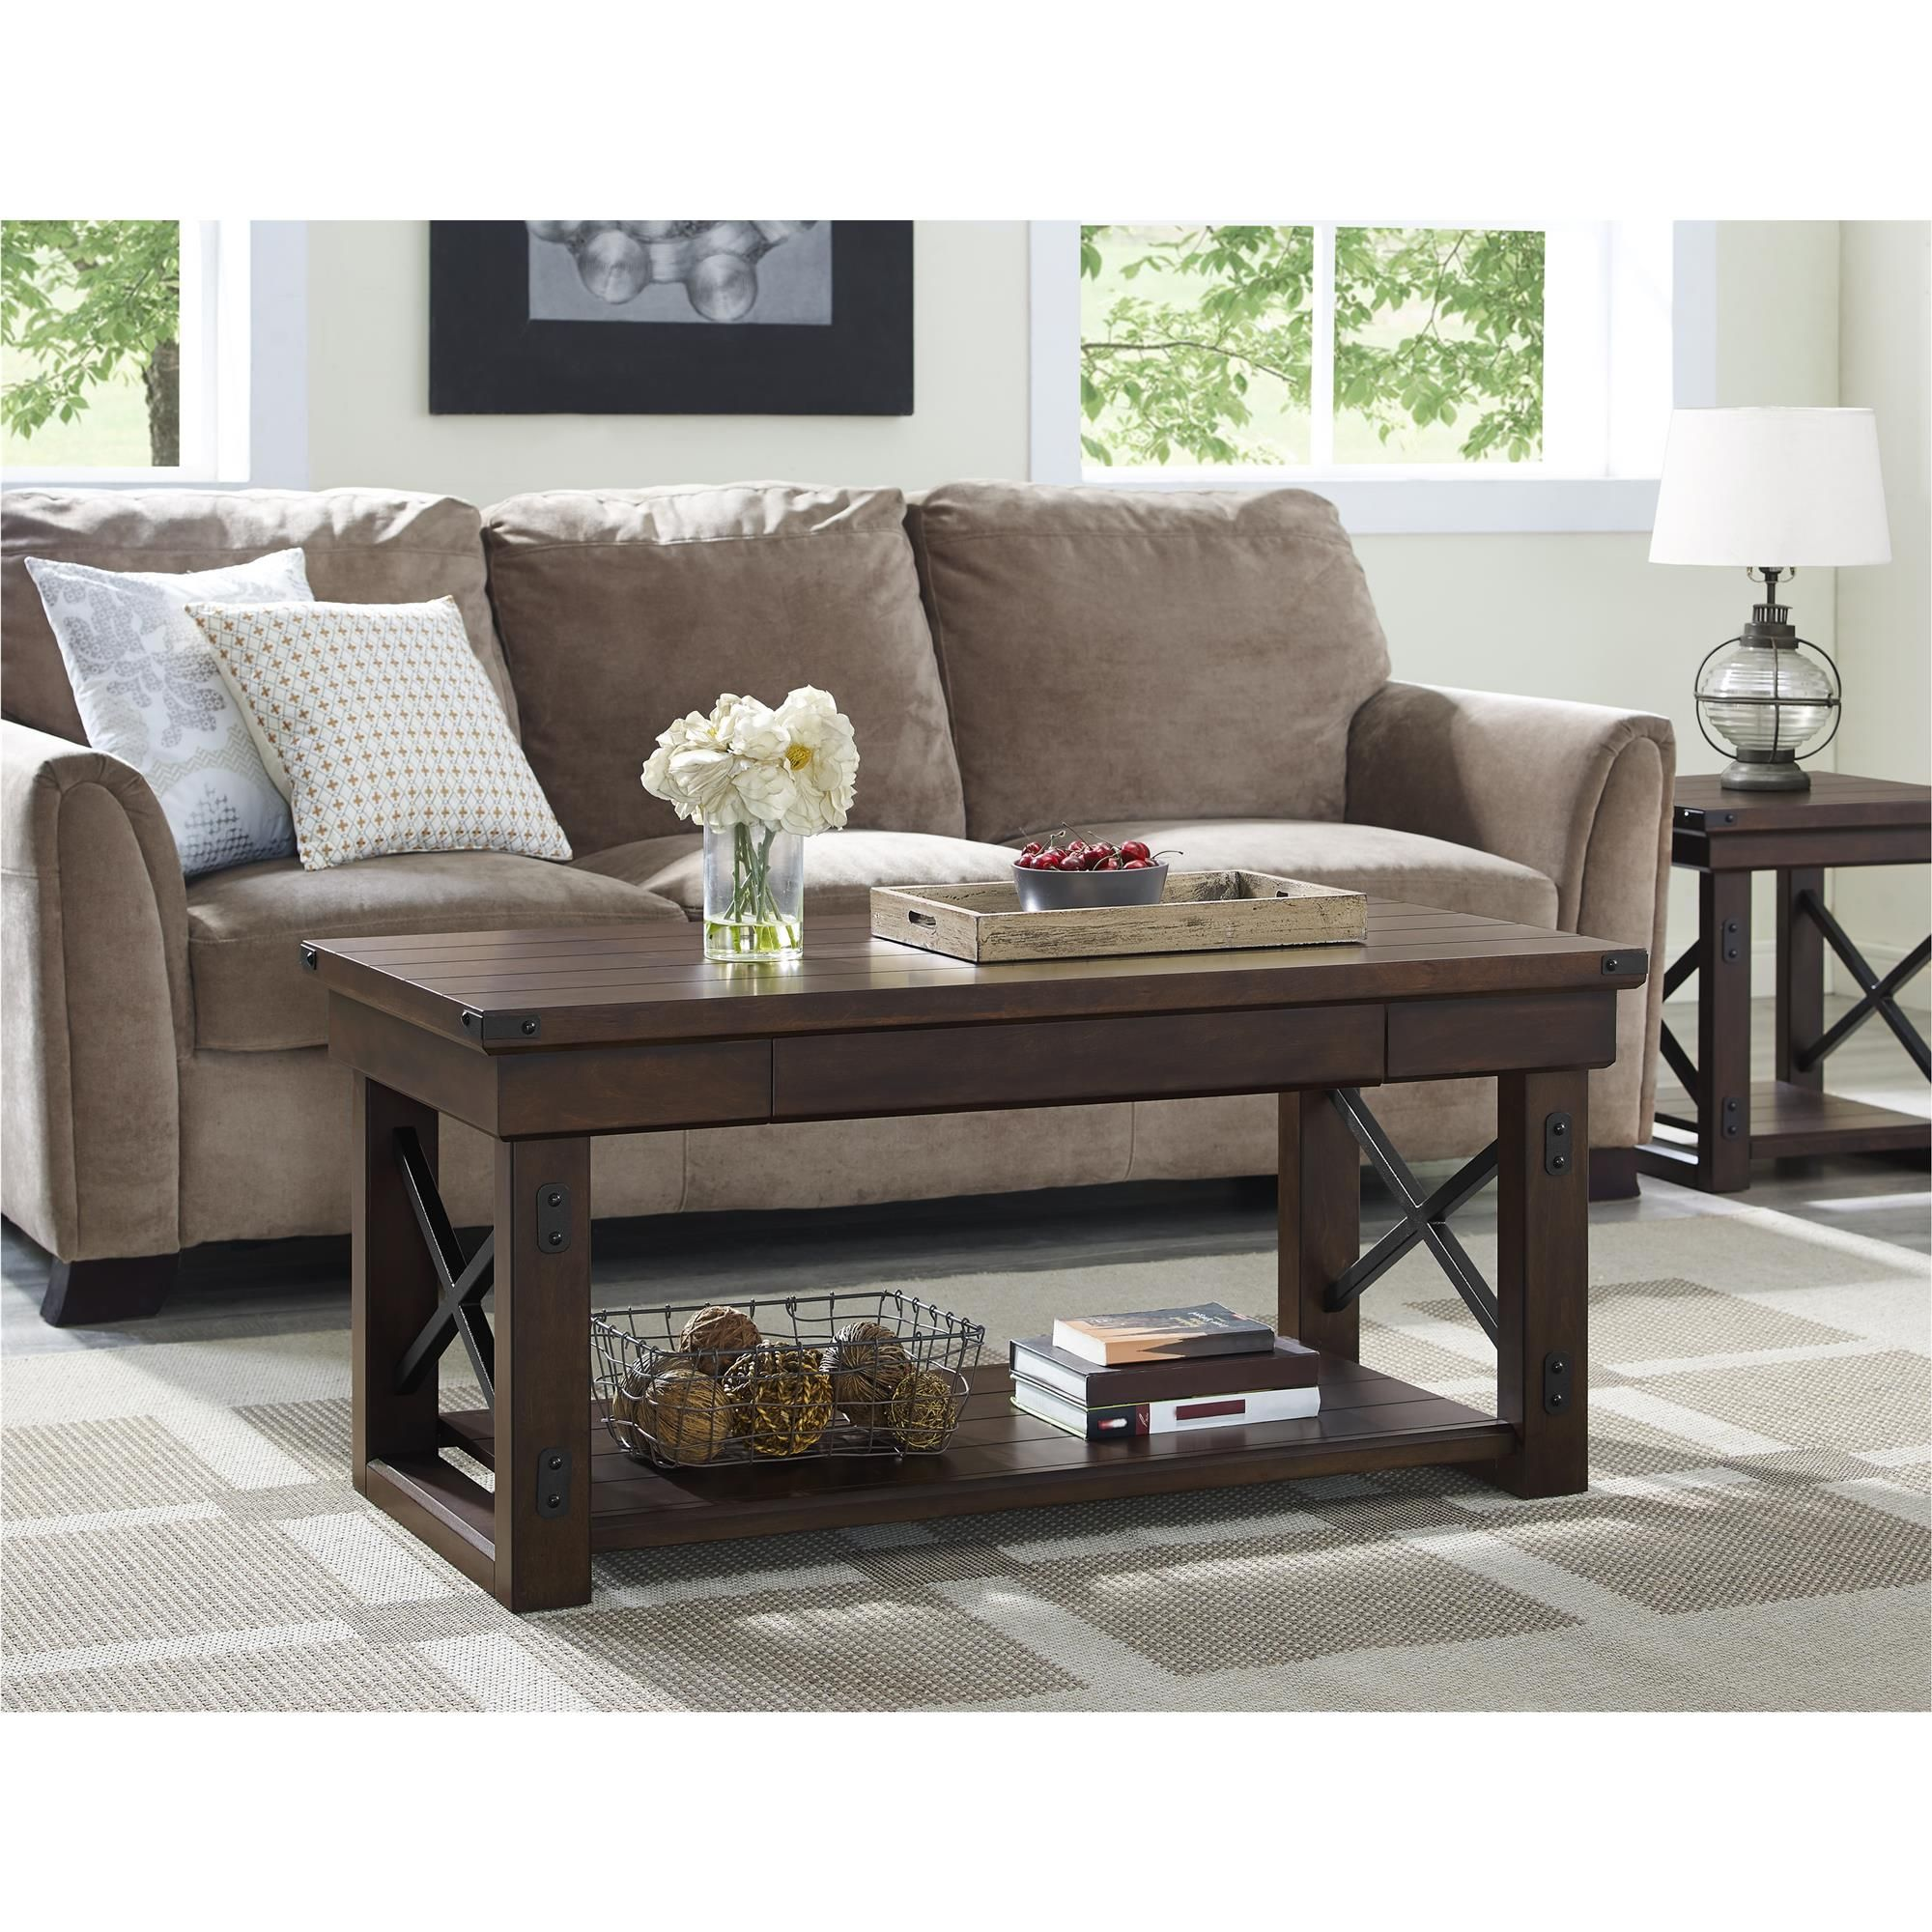 Dorel Home Furnishings Wildwood Mahogany Wood Veneer Coffee Table Brown Coffee Table Coffee Table Wood Altra Furniture [ 2000 x 2000 Pixel ]